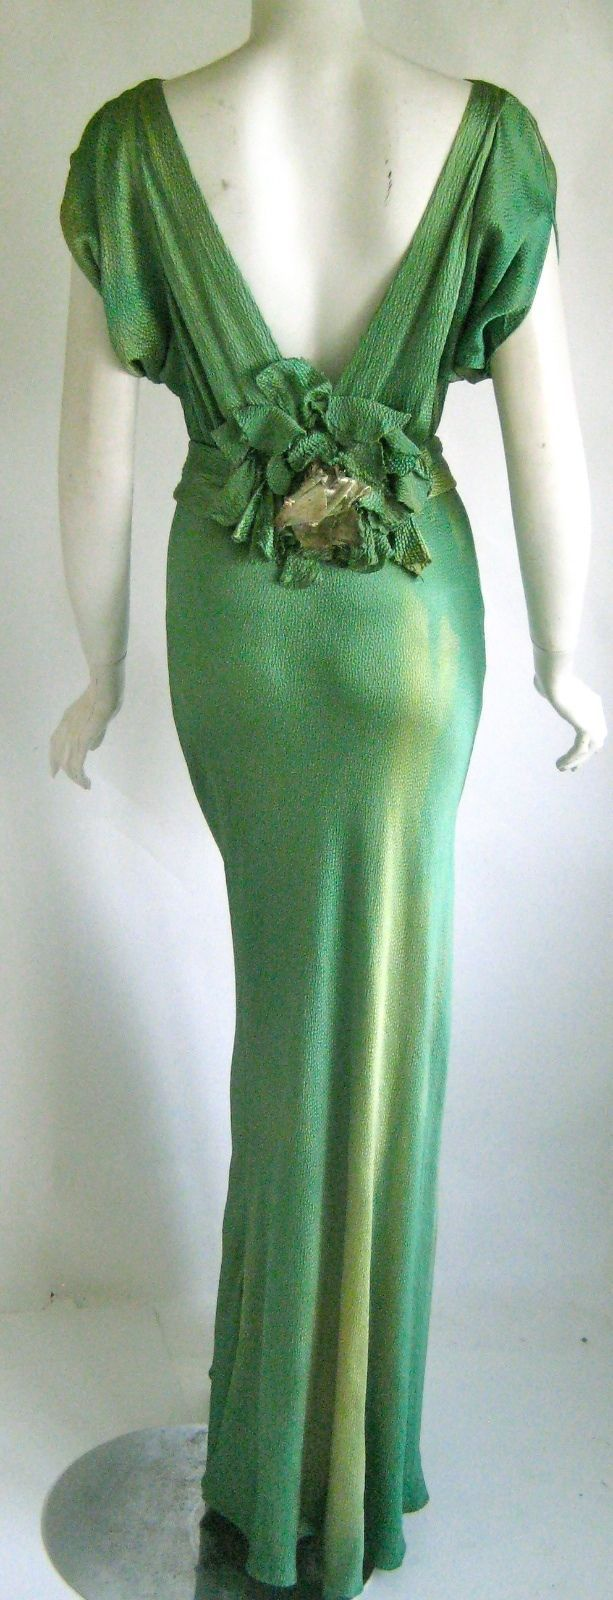 vintage 1930s art deco numbered screen star bias cut silk goddess evening gown